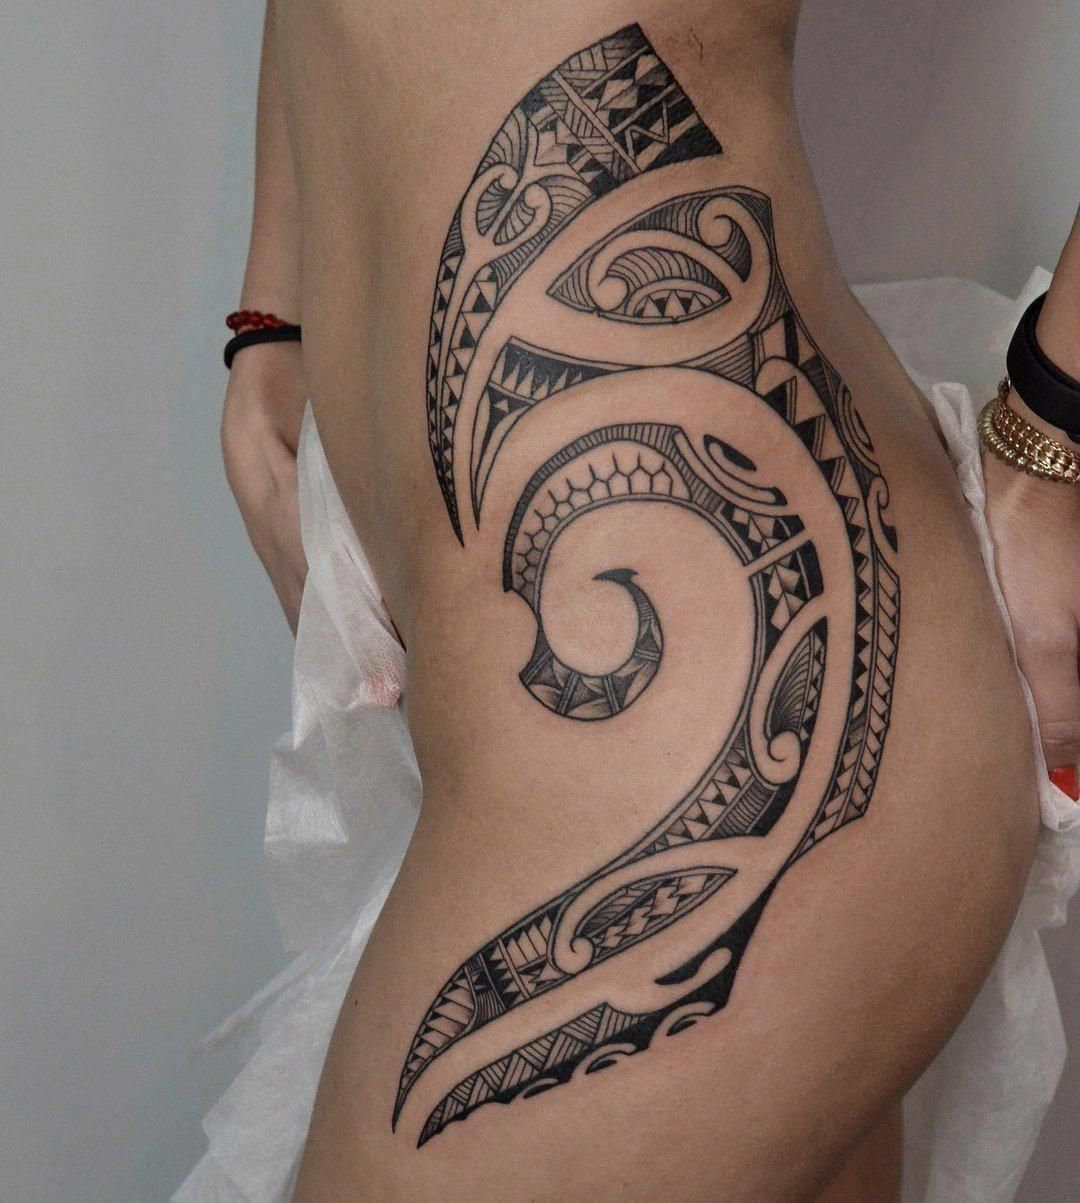 Samoan Tattoos And Symbols Samoantattoos Polynesiantattoosturtle Hip Tattoos Women Aztec Tribal Tattoos Polynesian Tattoos Women